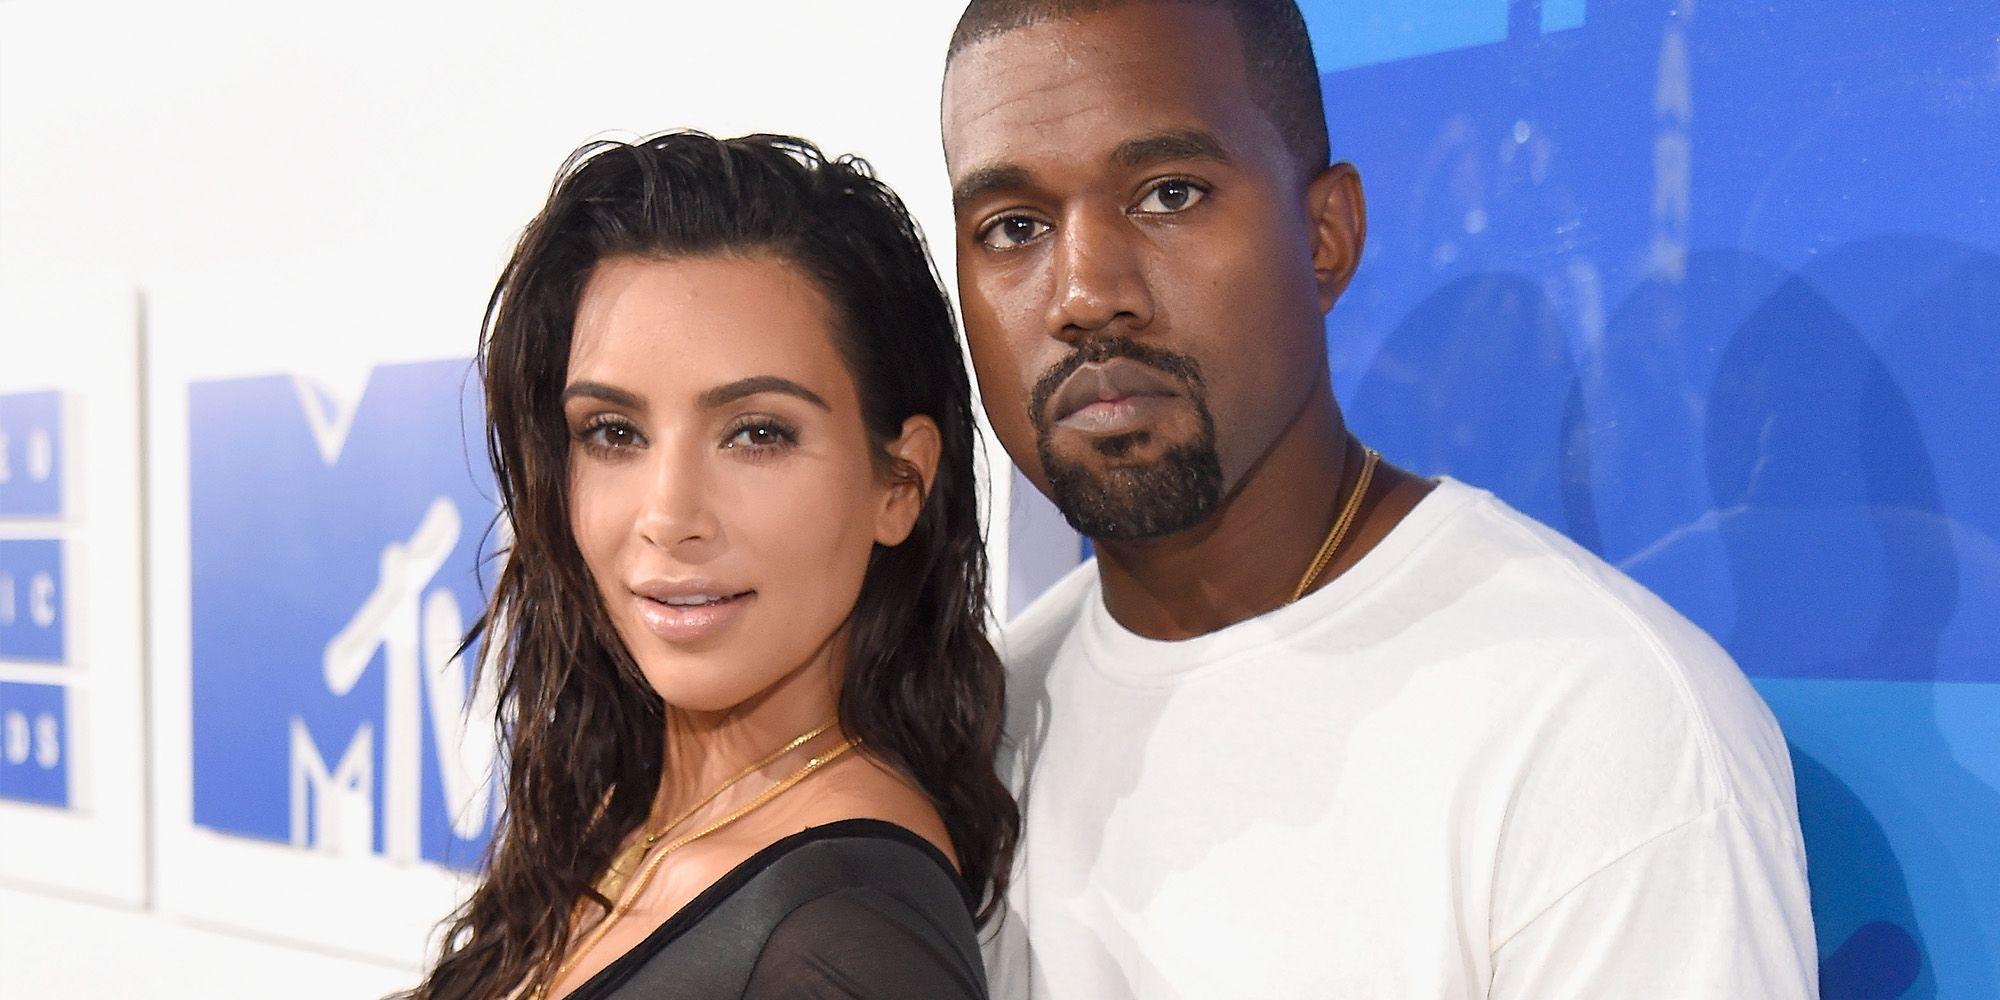 kuwk-kim-kardashian-says-husband-kanye-west-is-bipolar-explains-why-he-doesnt-take-his-meds